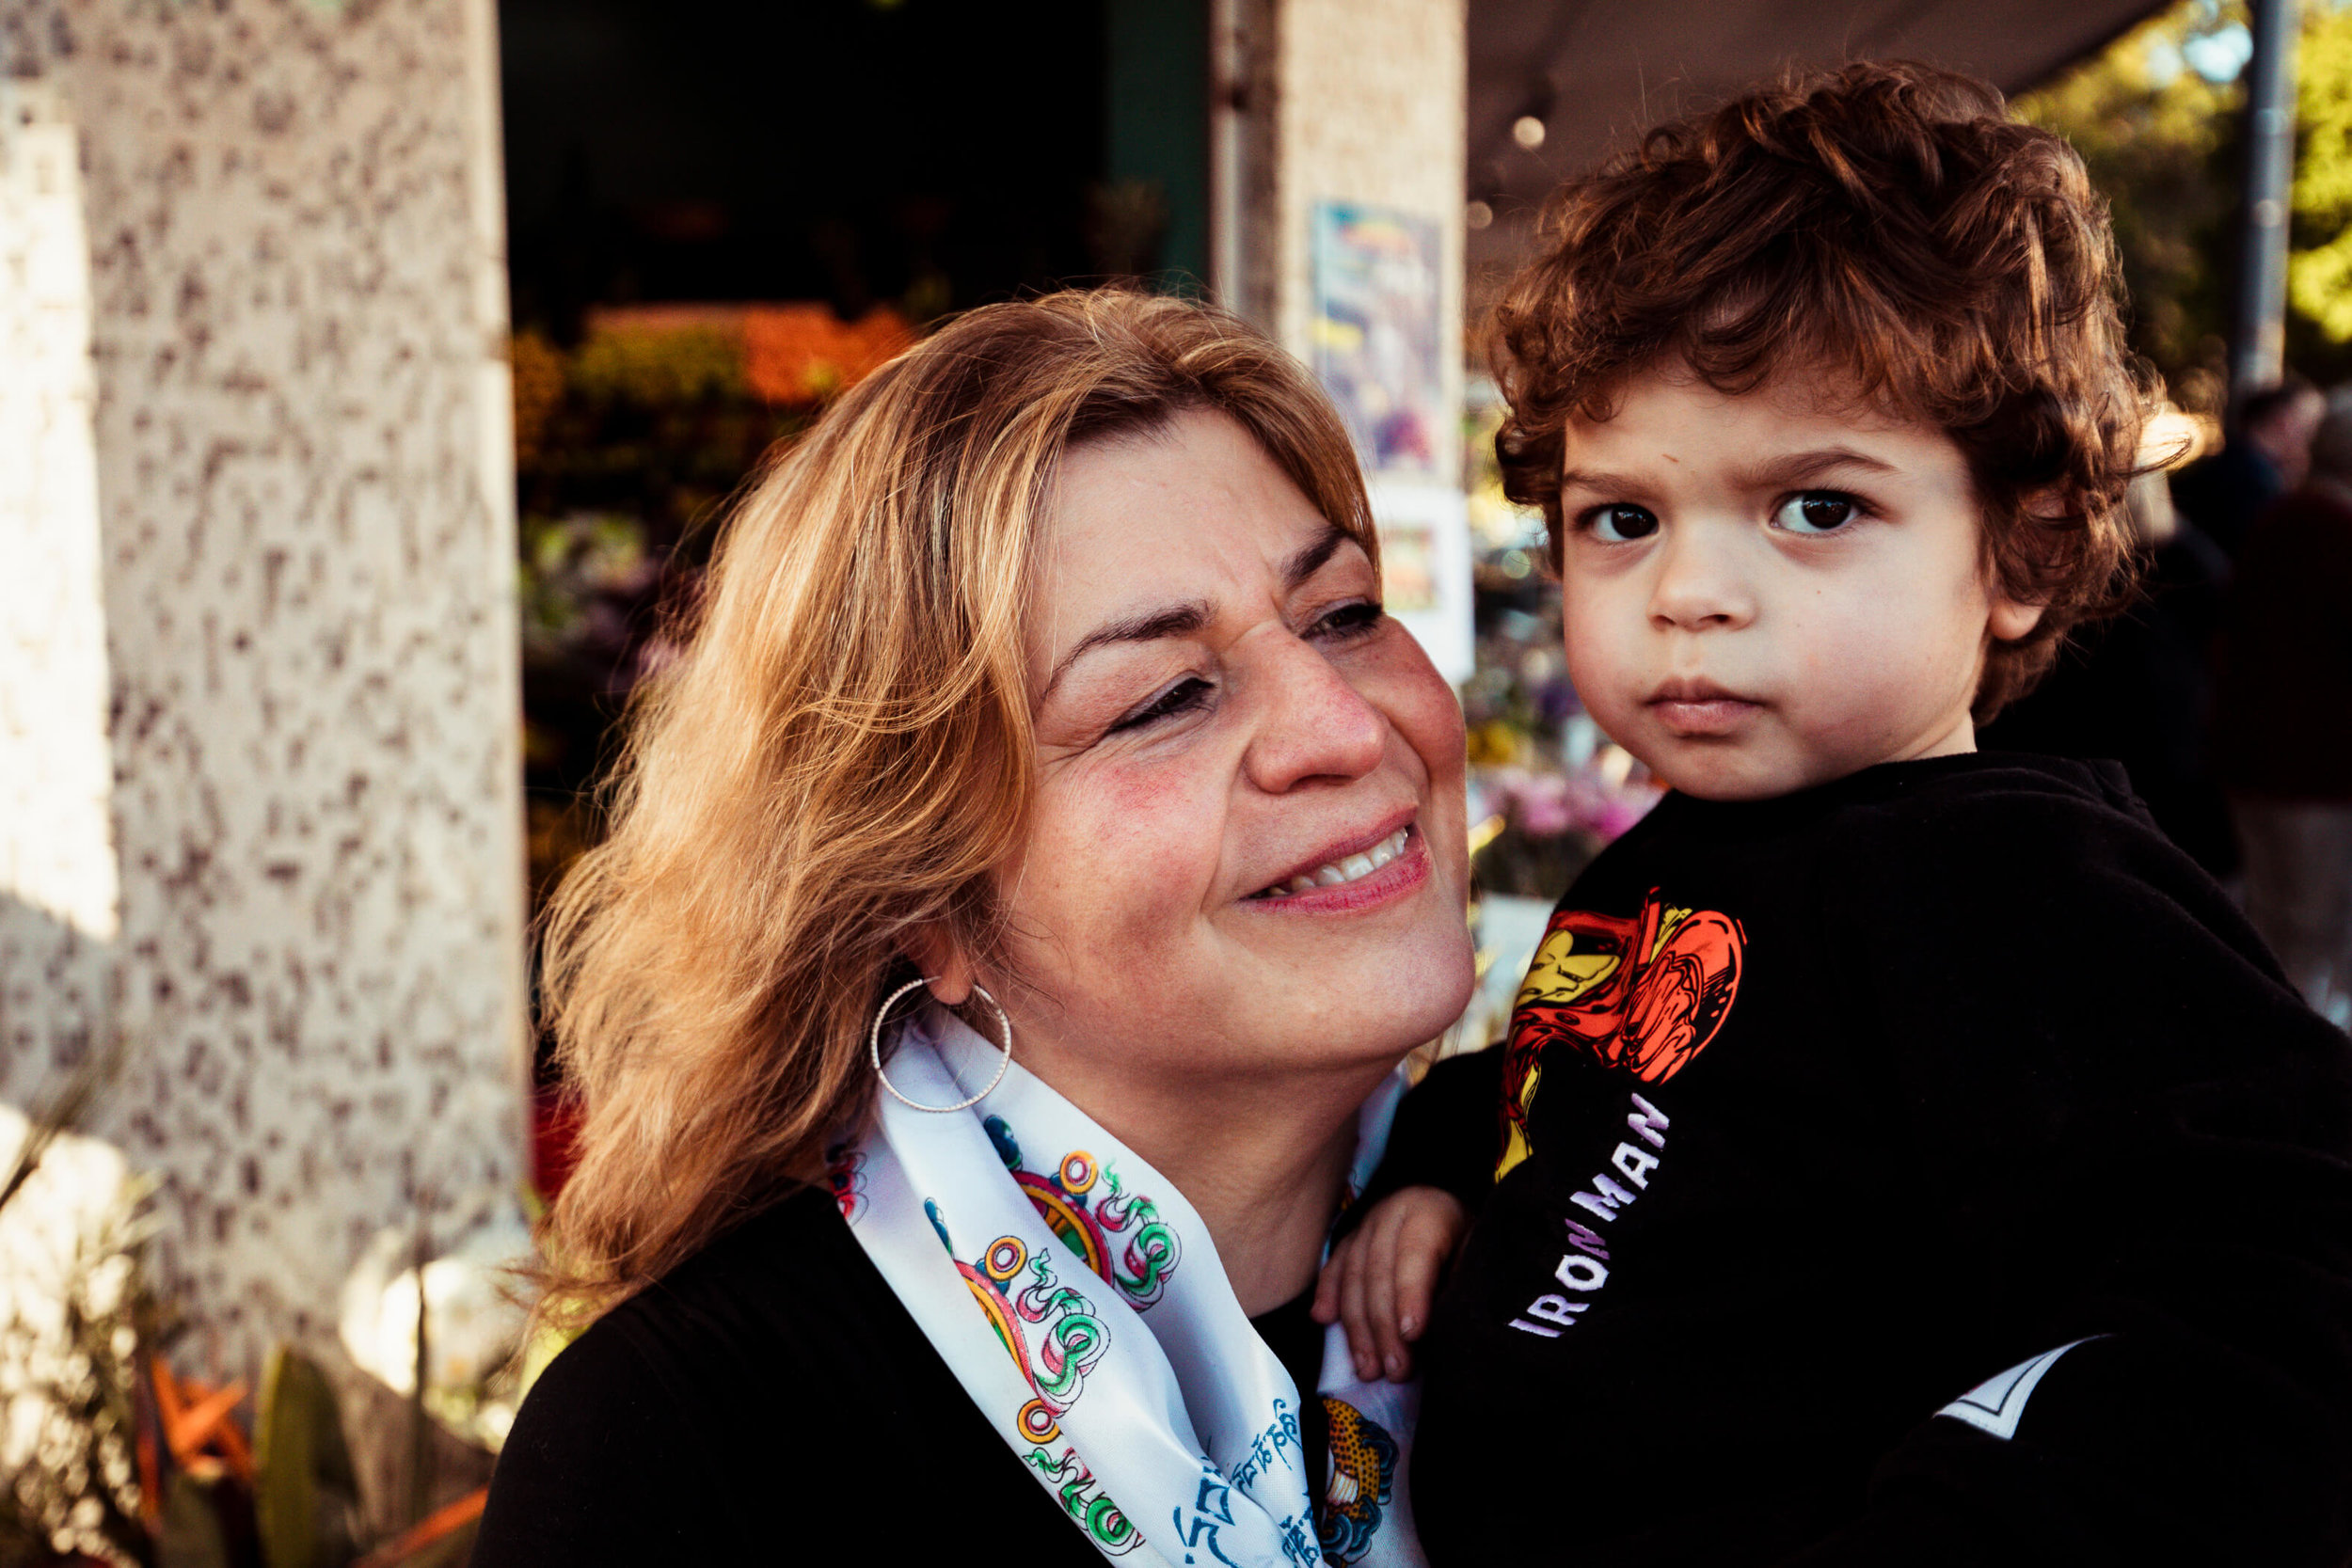 EMOTIONAL: Toula Koustoubardis and grandson Dimitri.